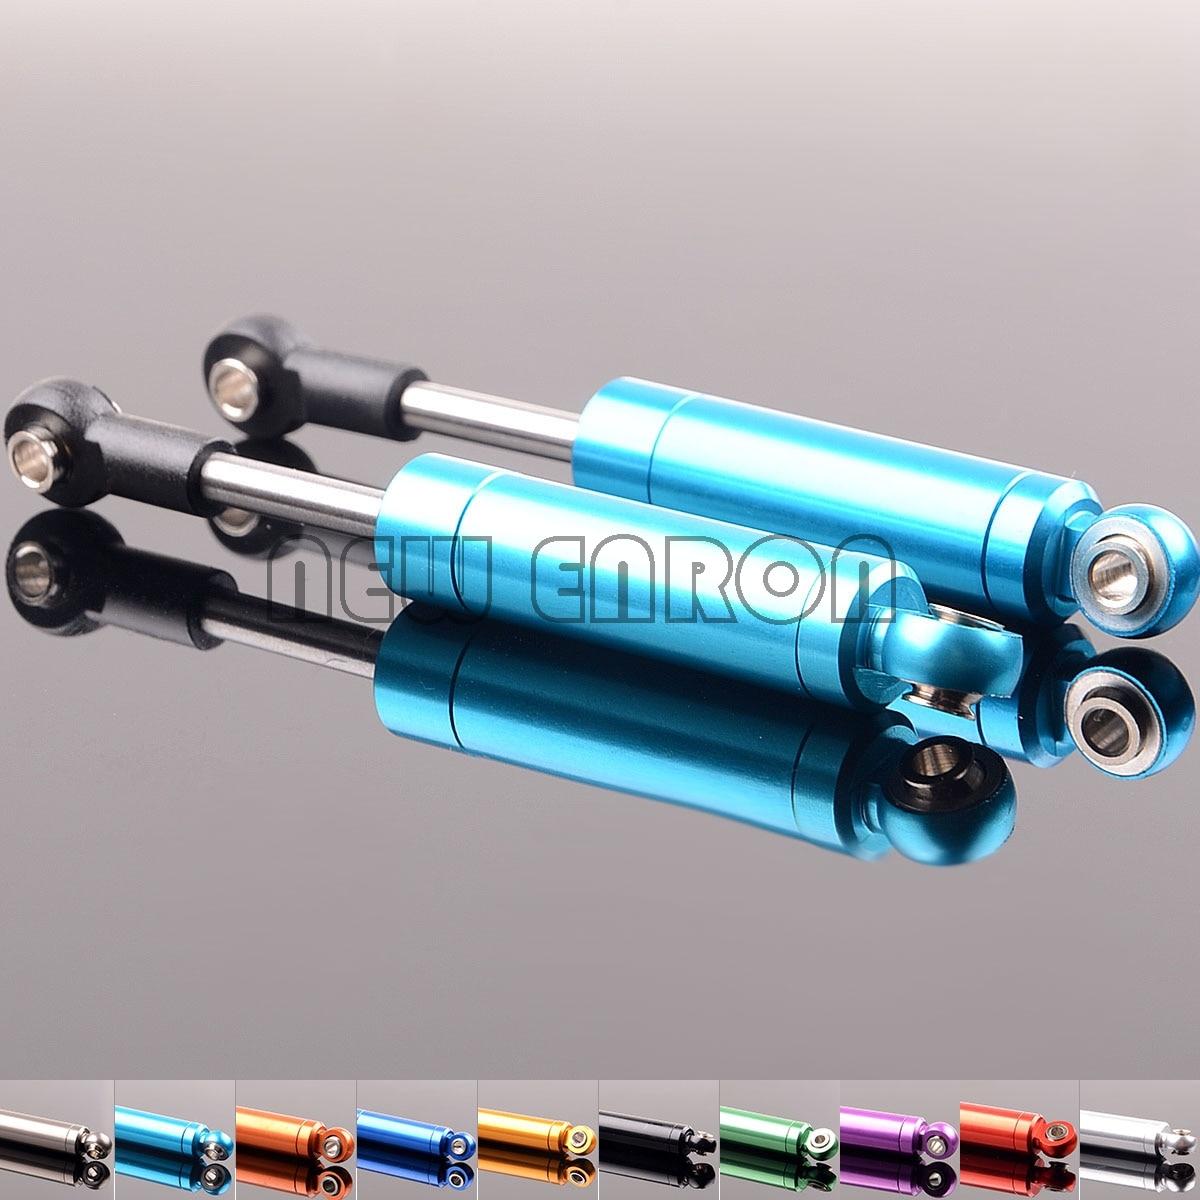 Nova enron 2 p 1/10 amortecedor de alumínio 54-62mm int amortecedor rc tamiya kyosho axial hpi lagartas caminhões de carro cc01 scx10